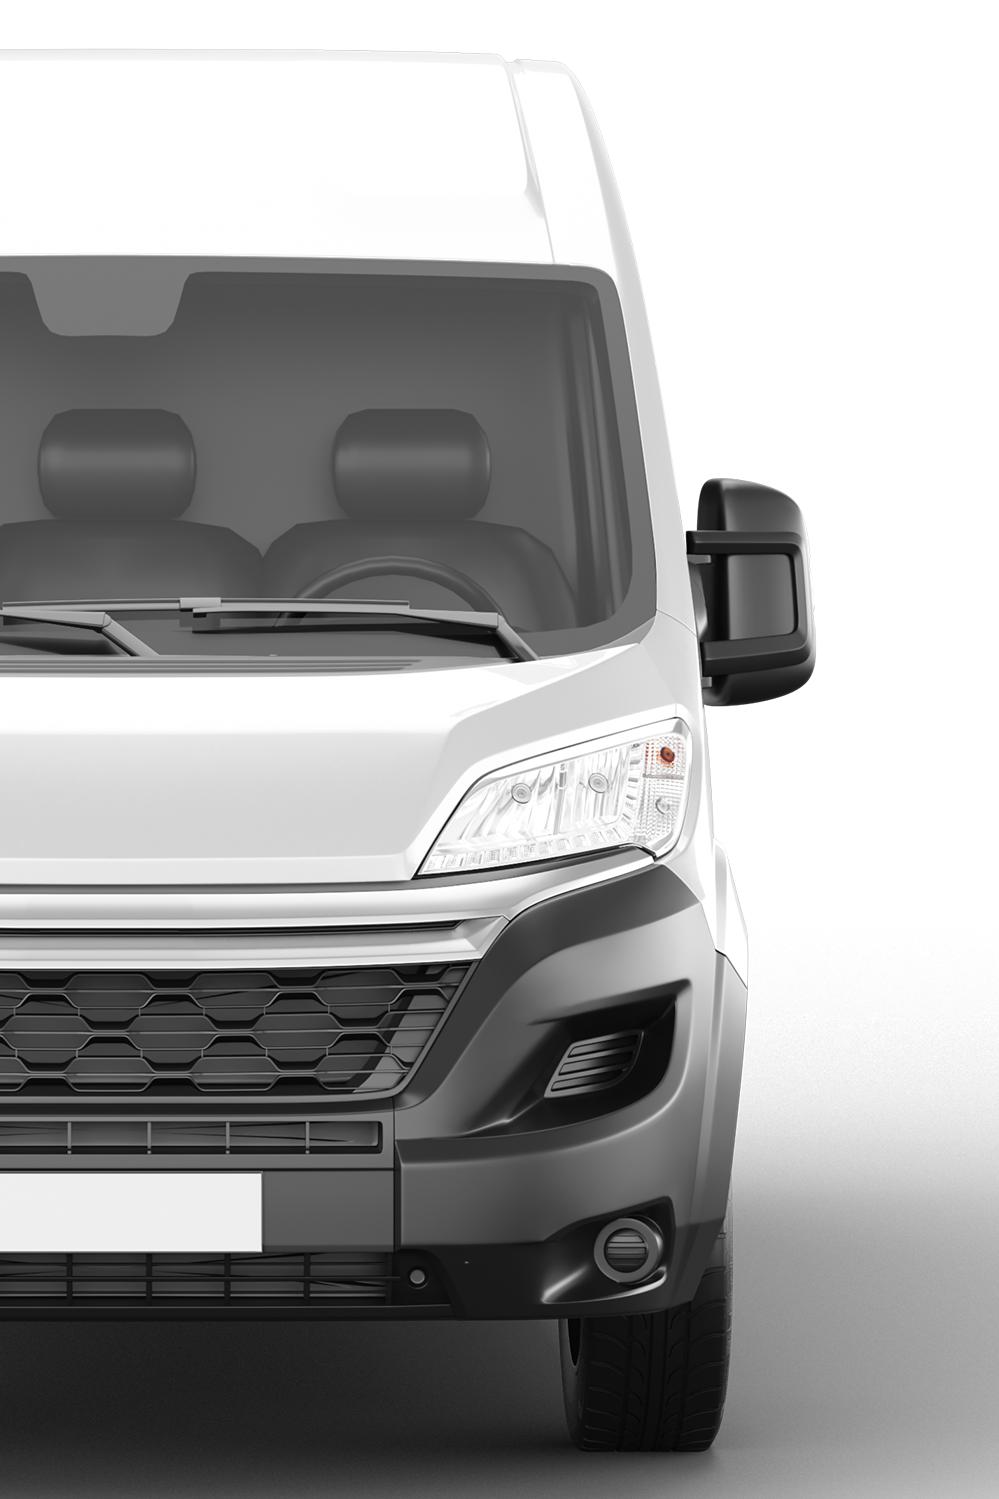 Van Mockup 12 Van Signage Car Sticker Design Van Design